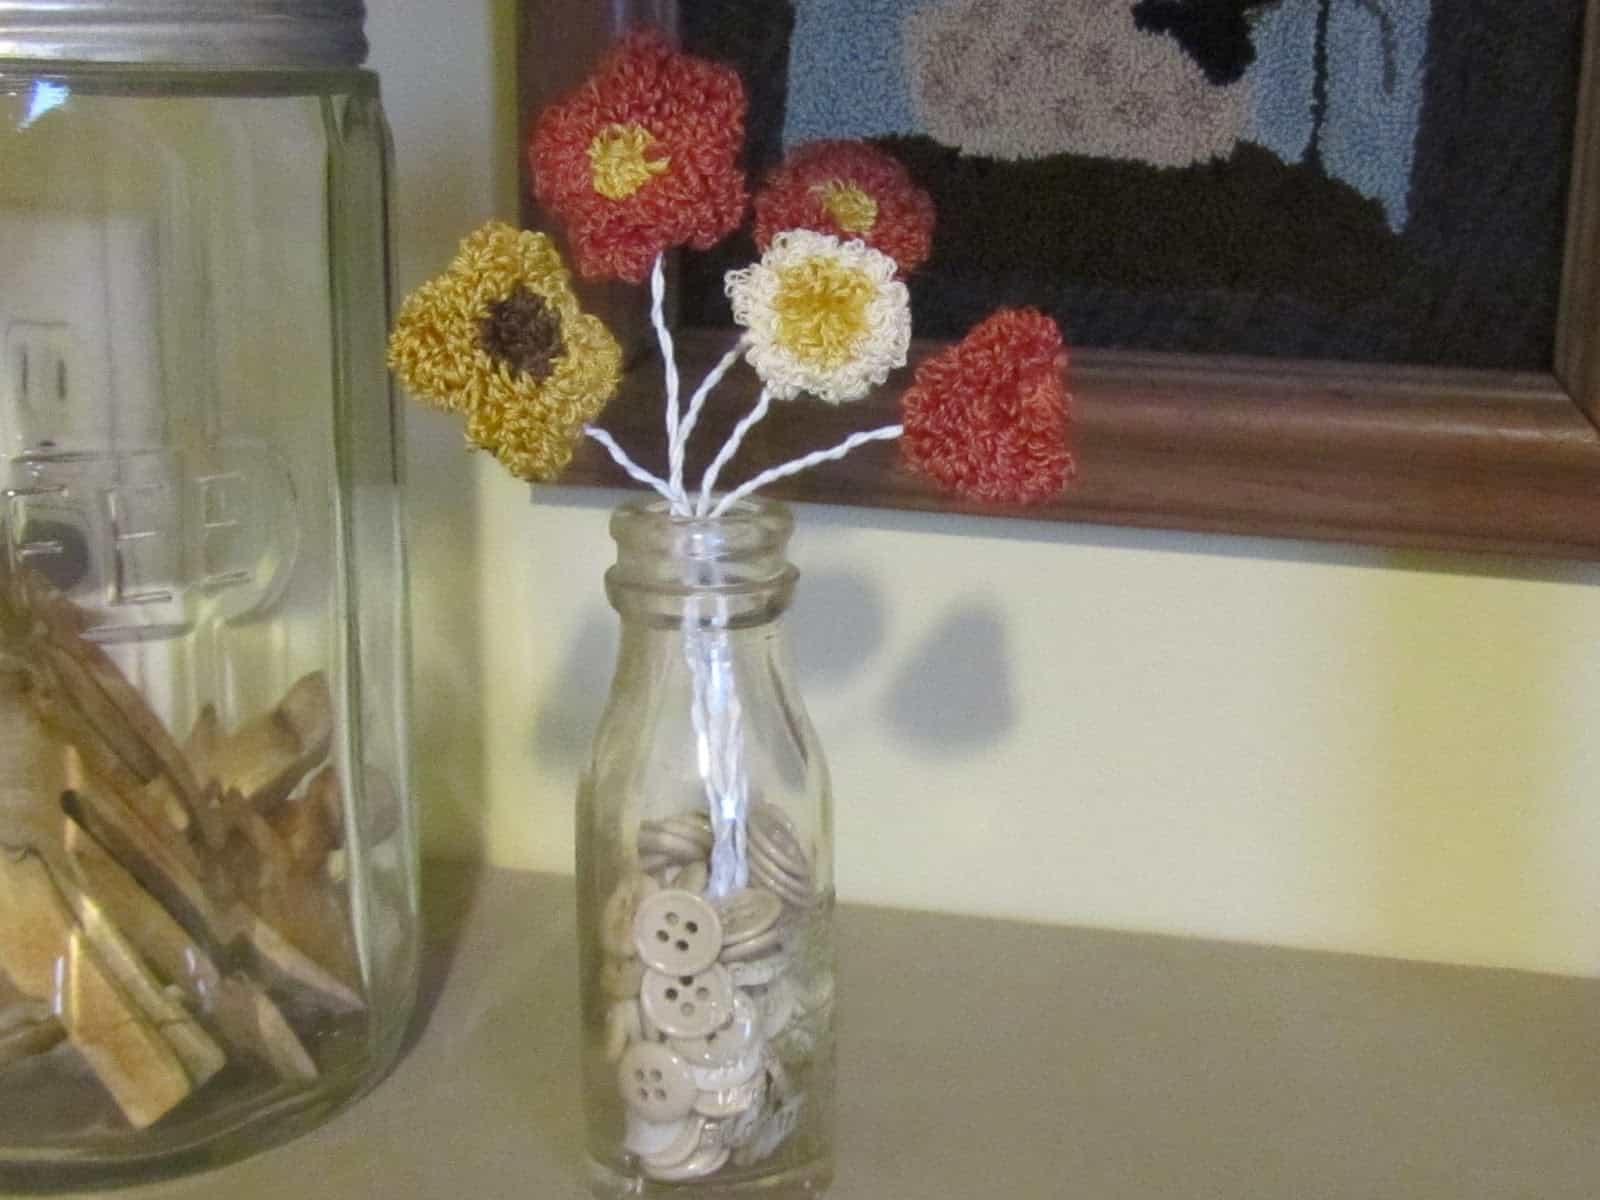 finished jar of punch needle flowers